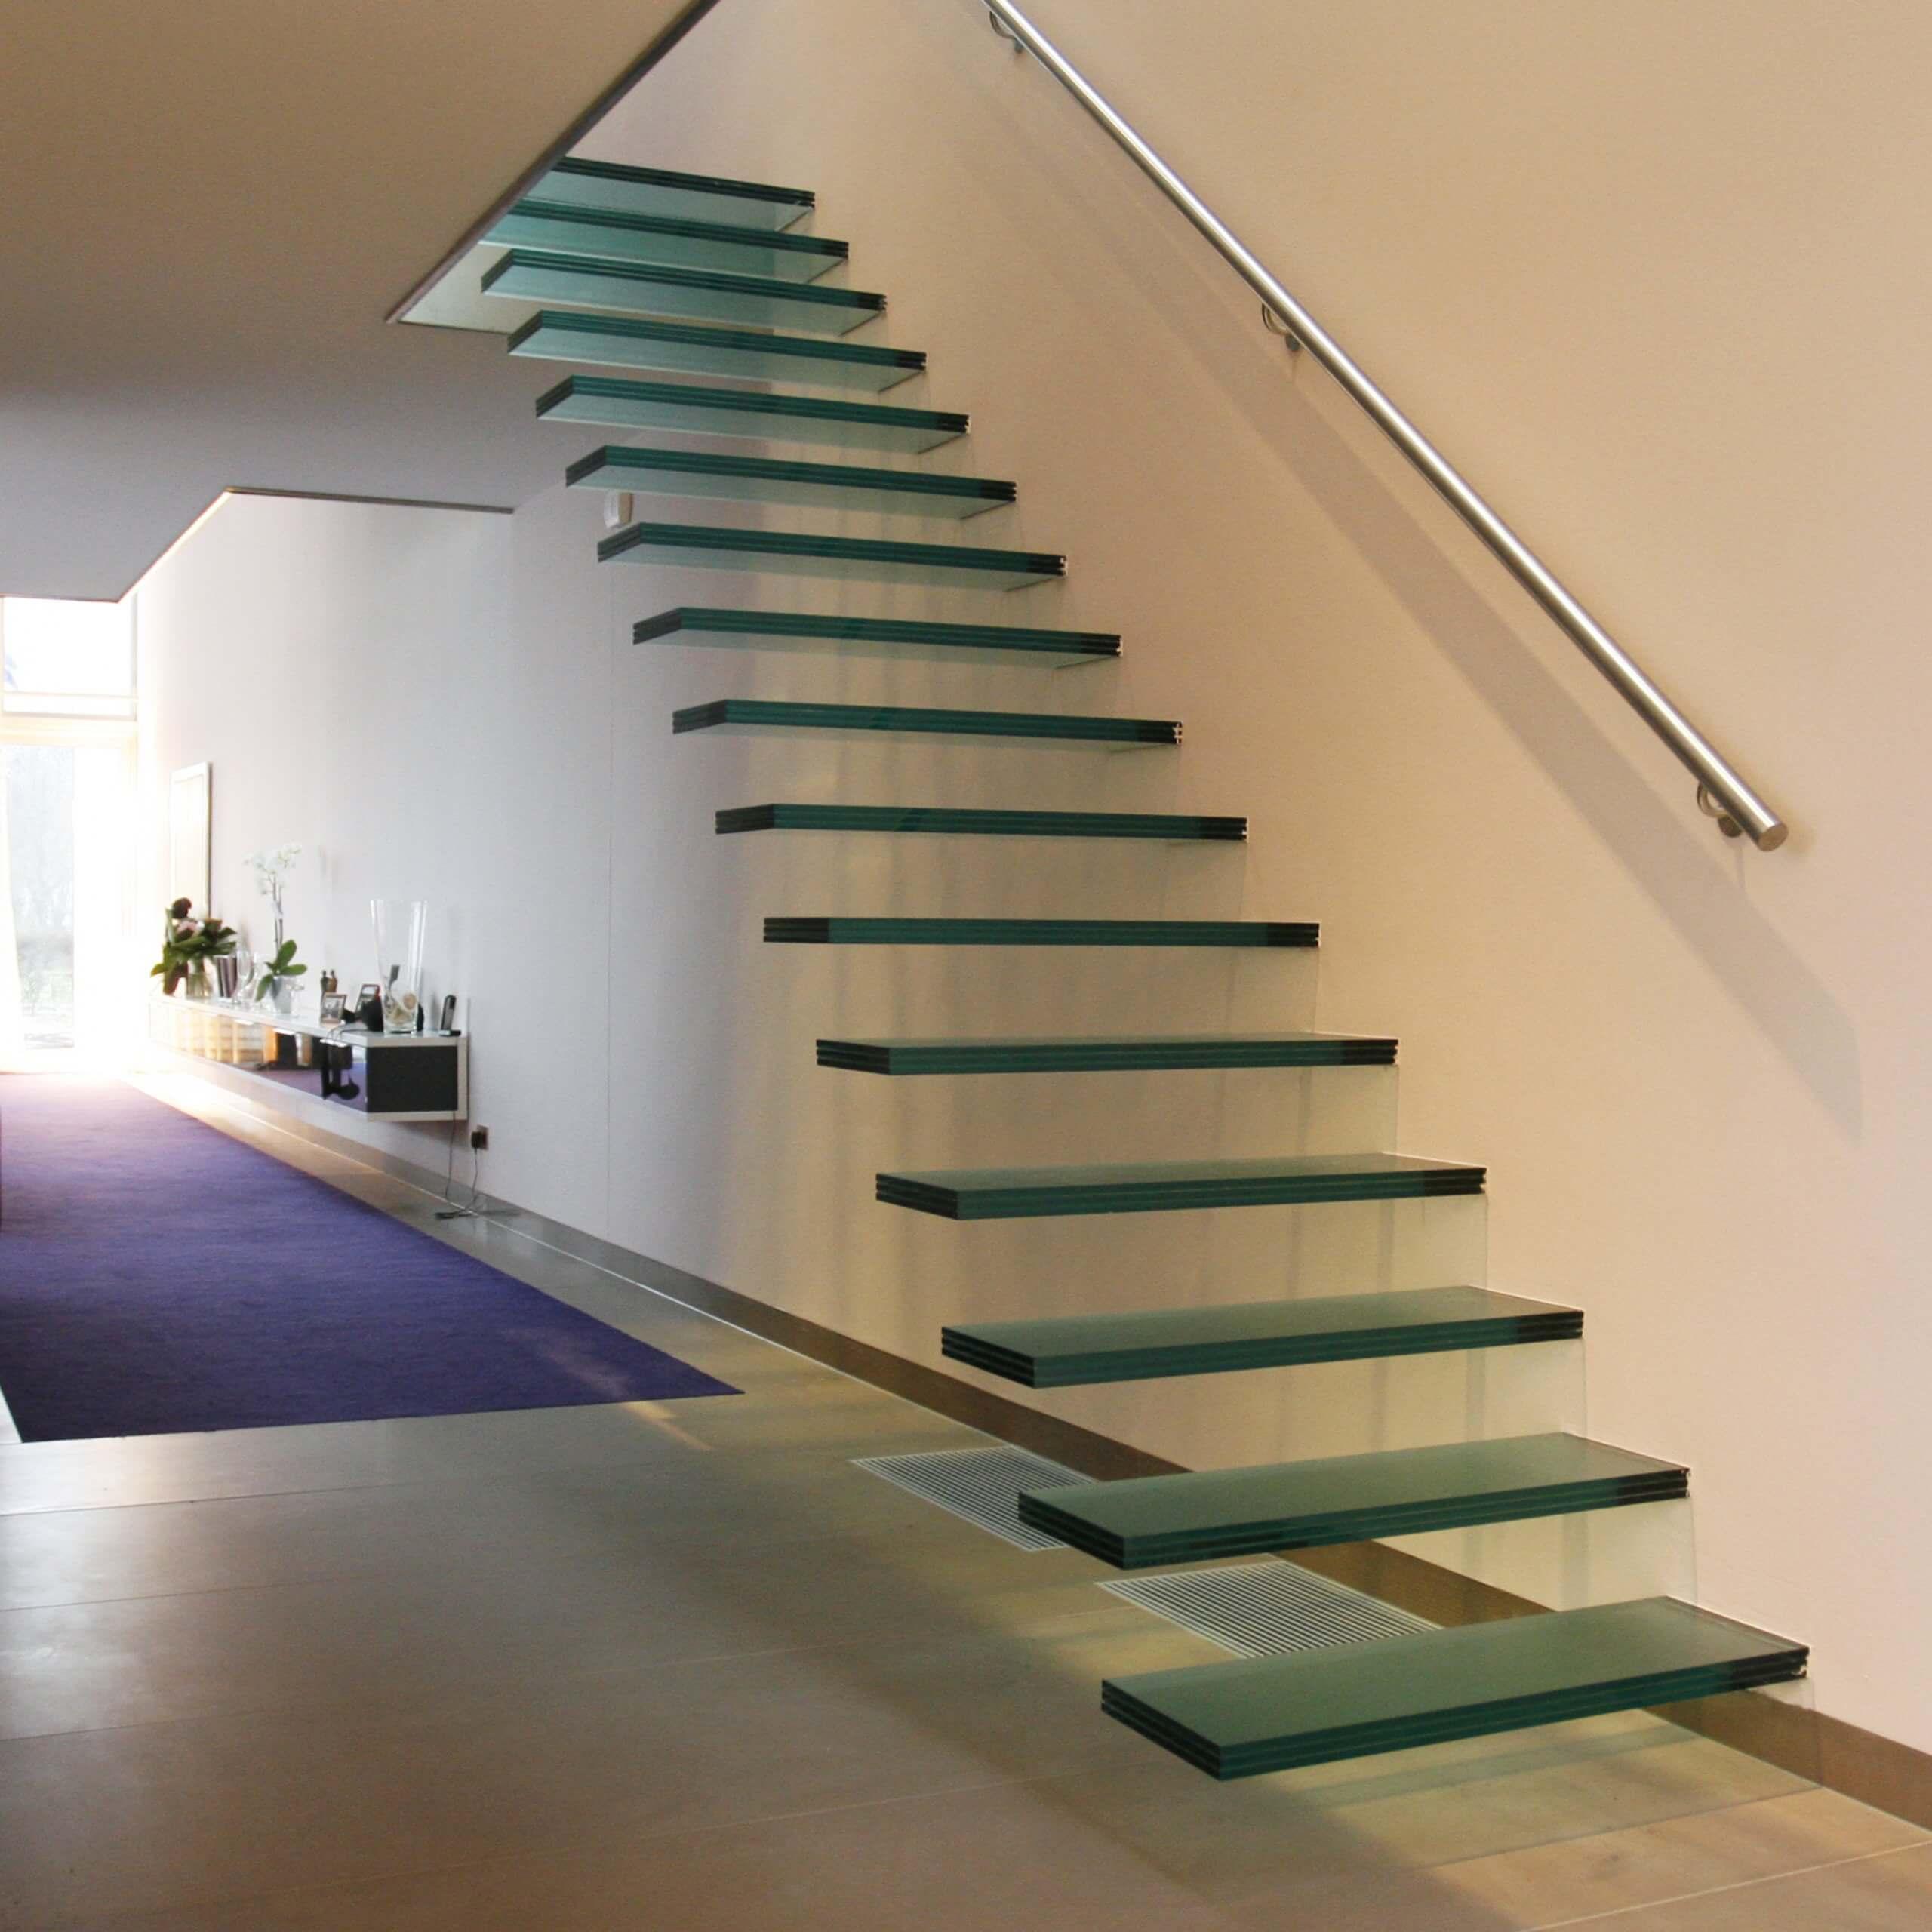 cam-merdiven-modelleri-3